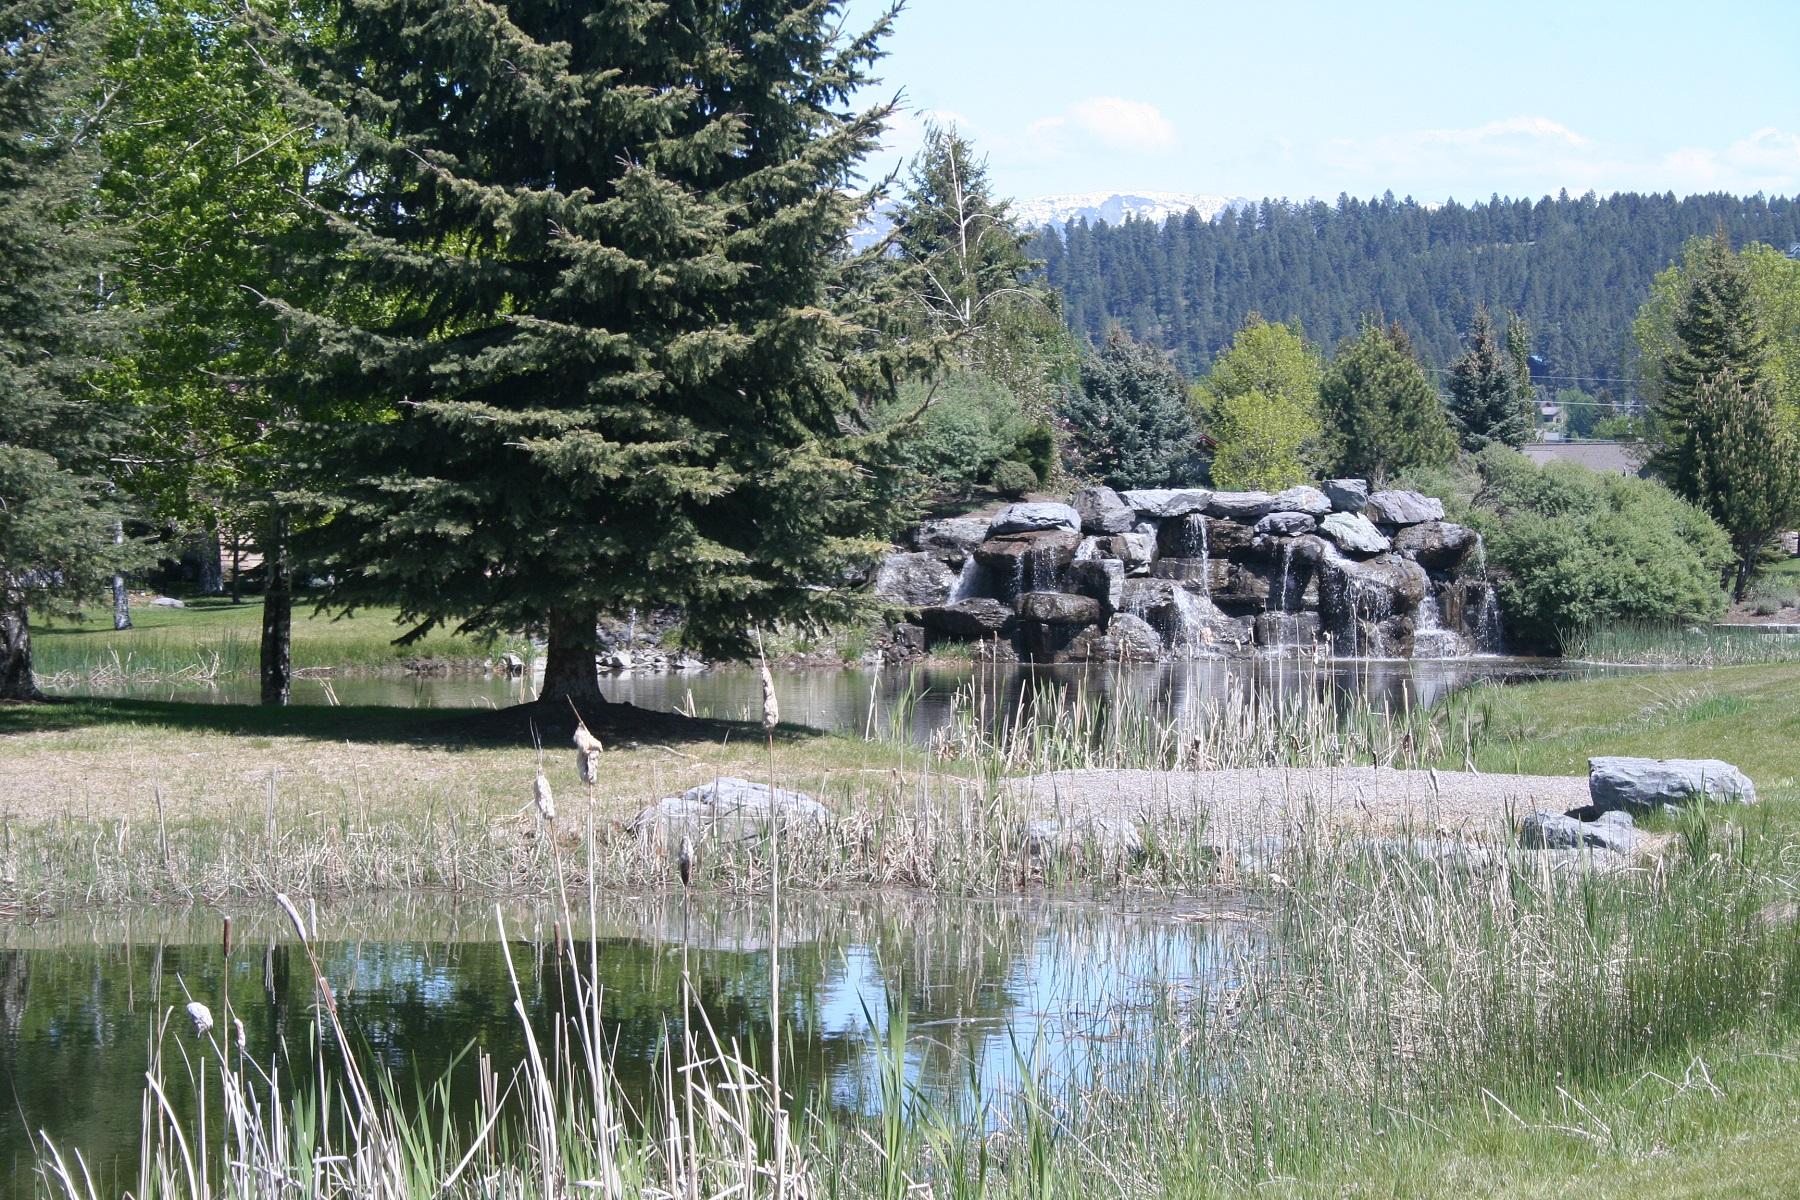 Terreno para Venda às 232 Harbor Dirve 232 Harbor Drive Bigfork, Montana 59911 Estados Unidos